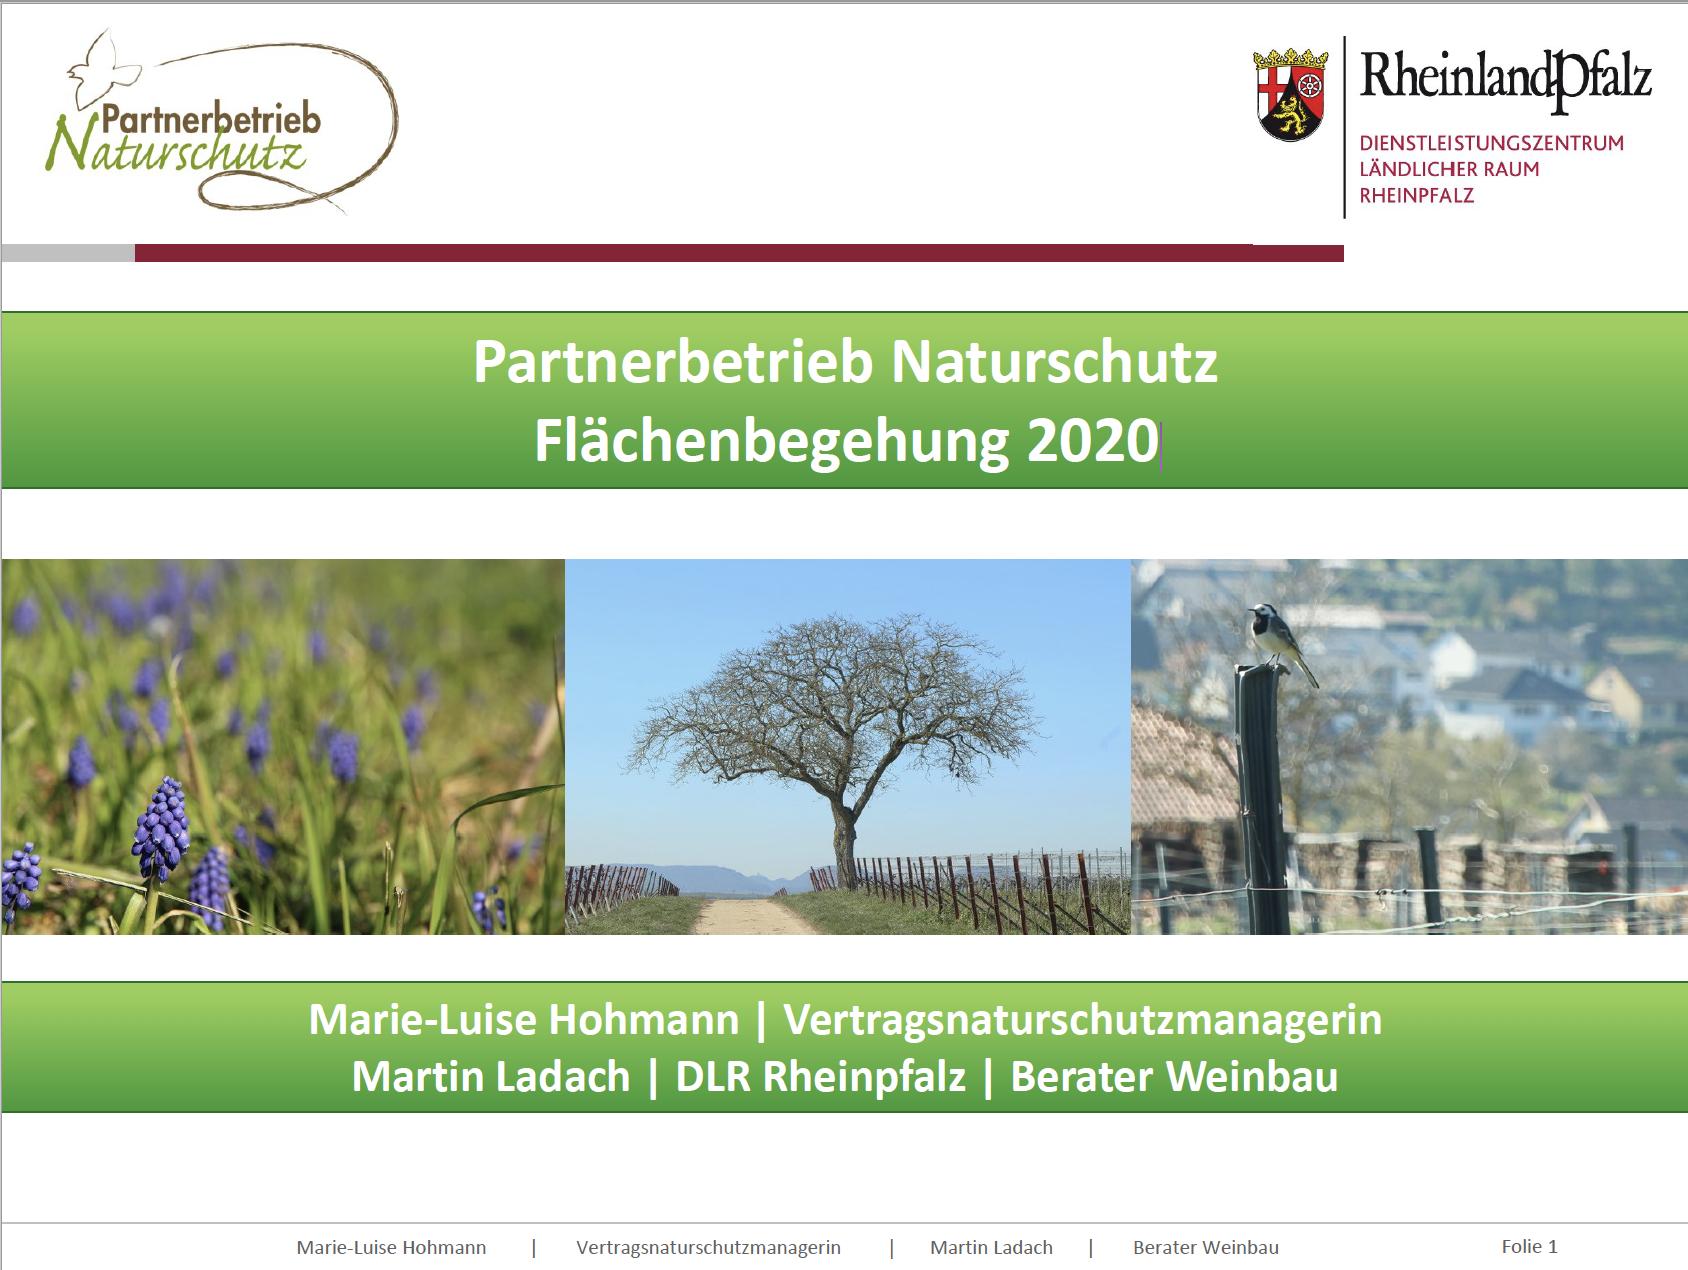 Partnerbetrieb_Naturschutz